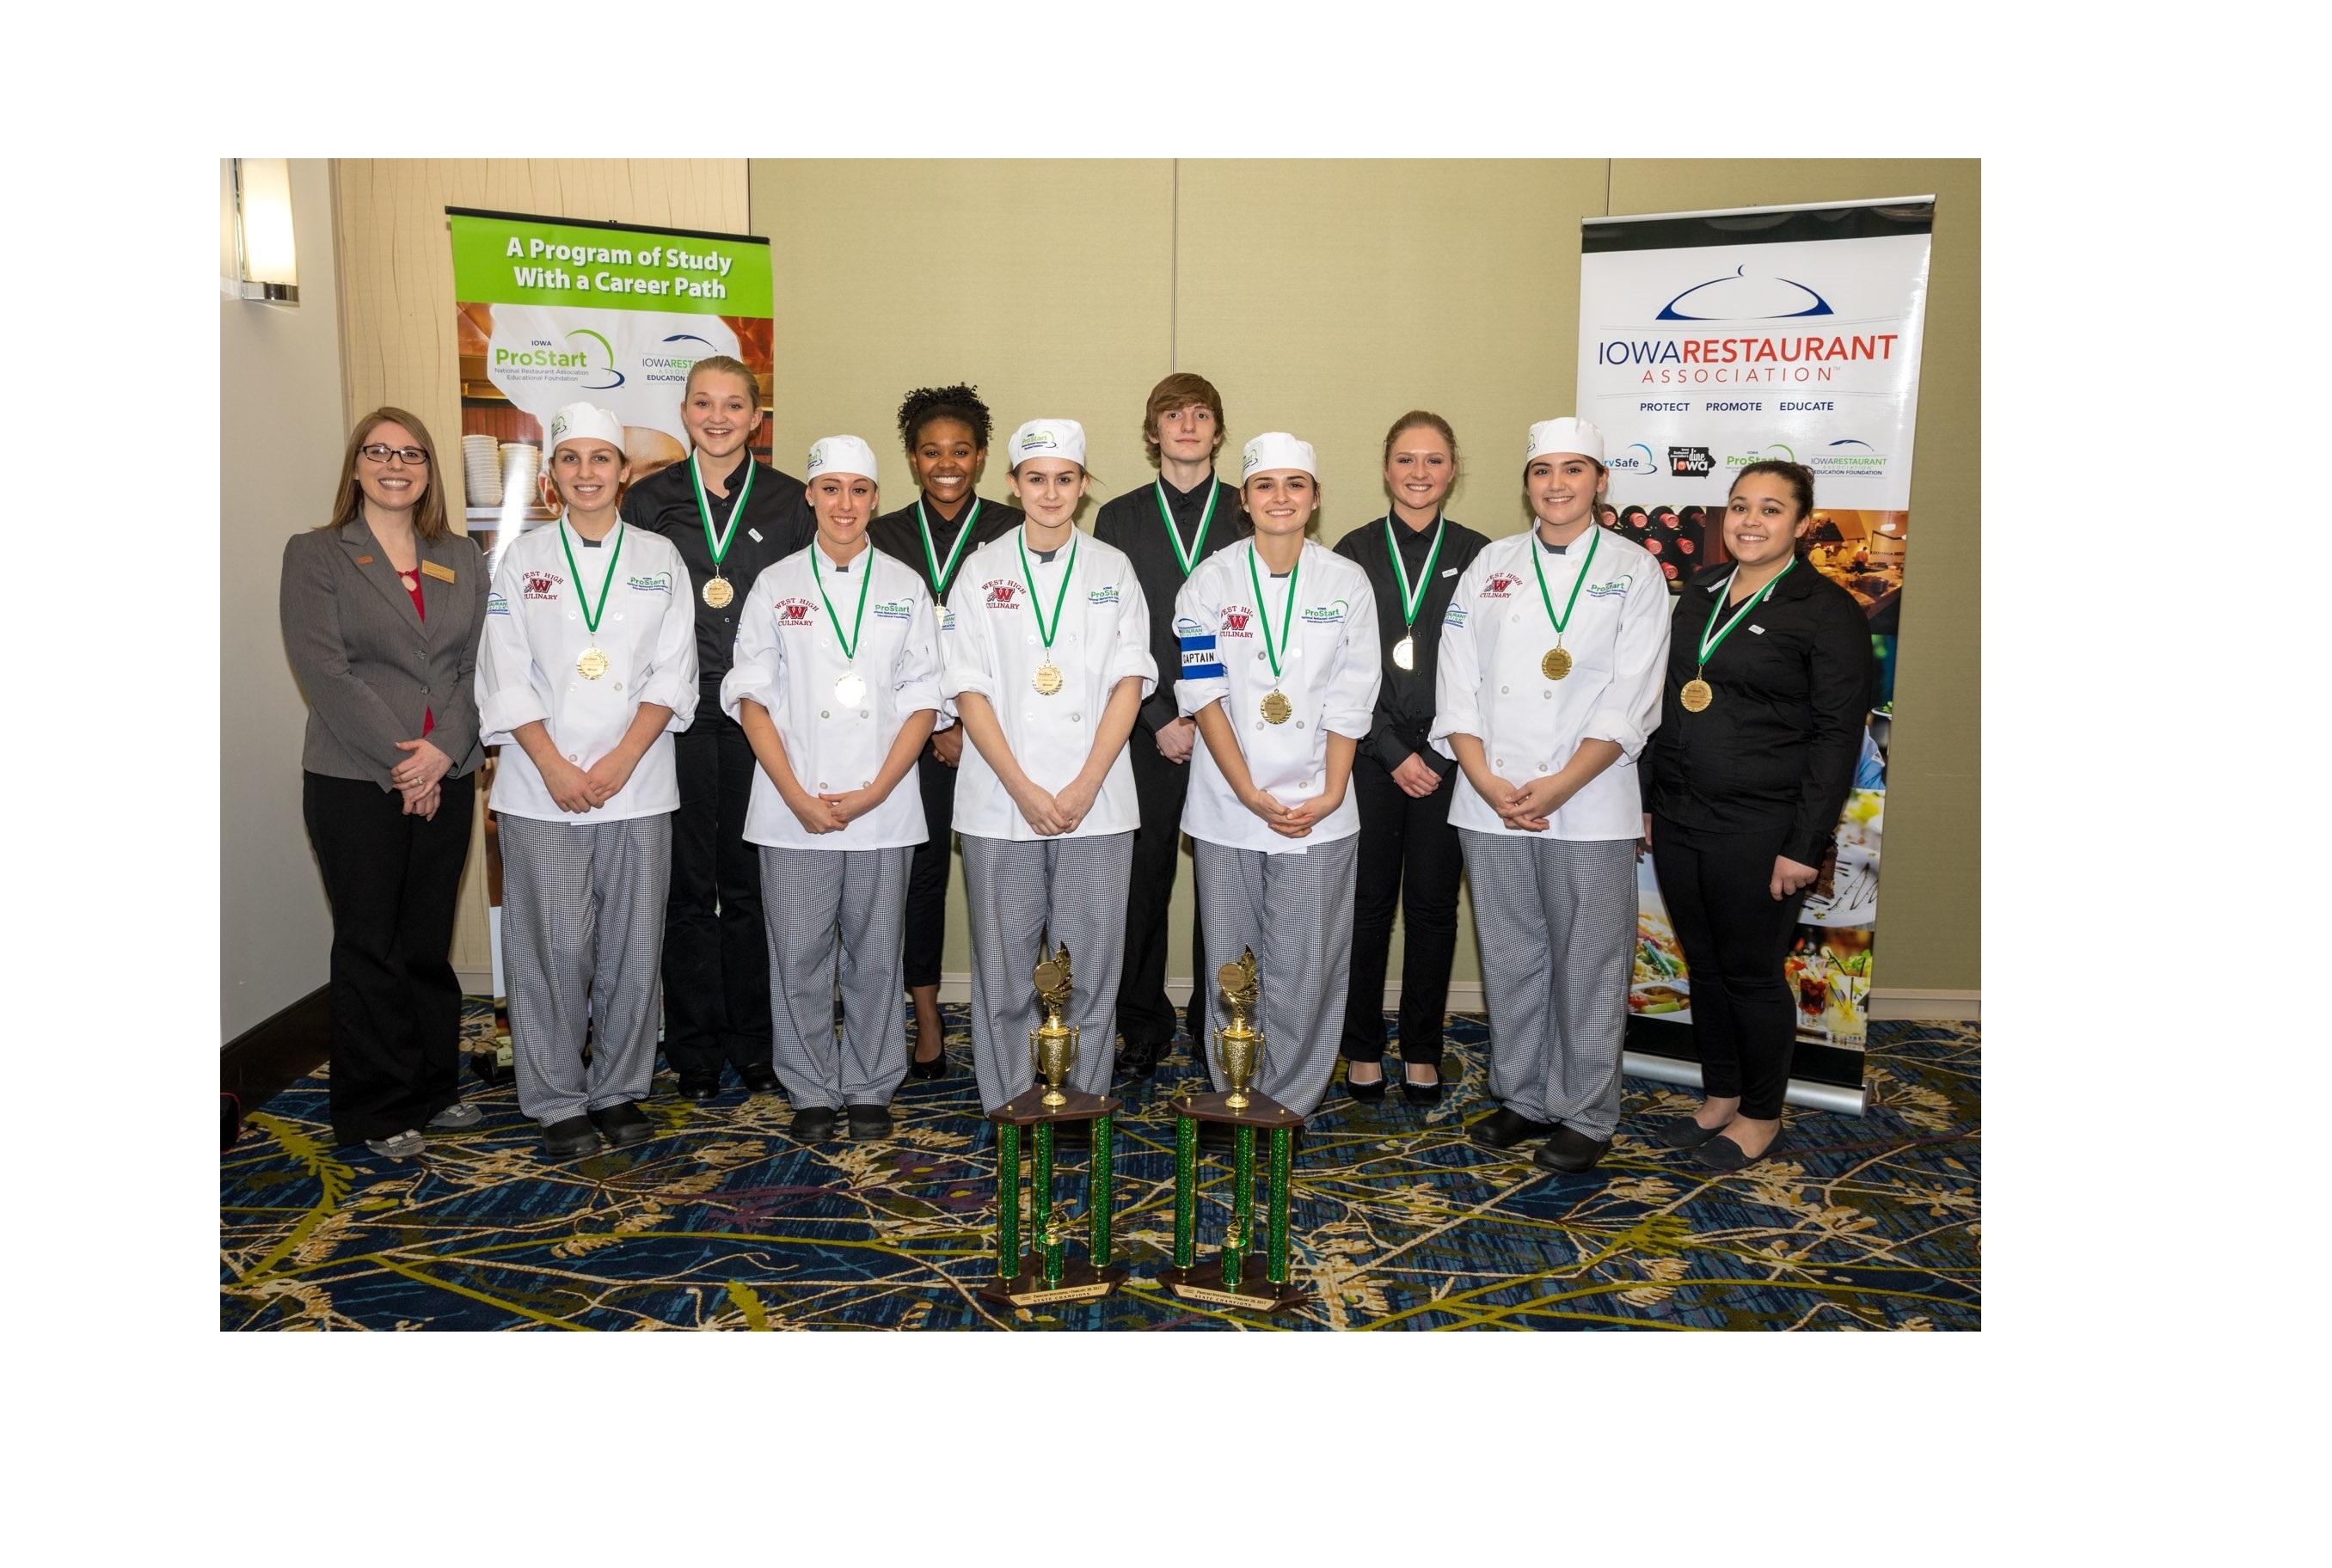 Congratulations ProStart Champions